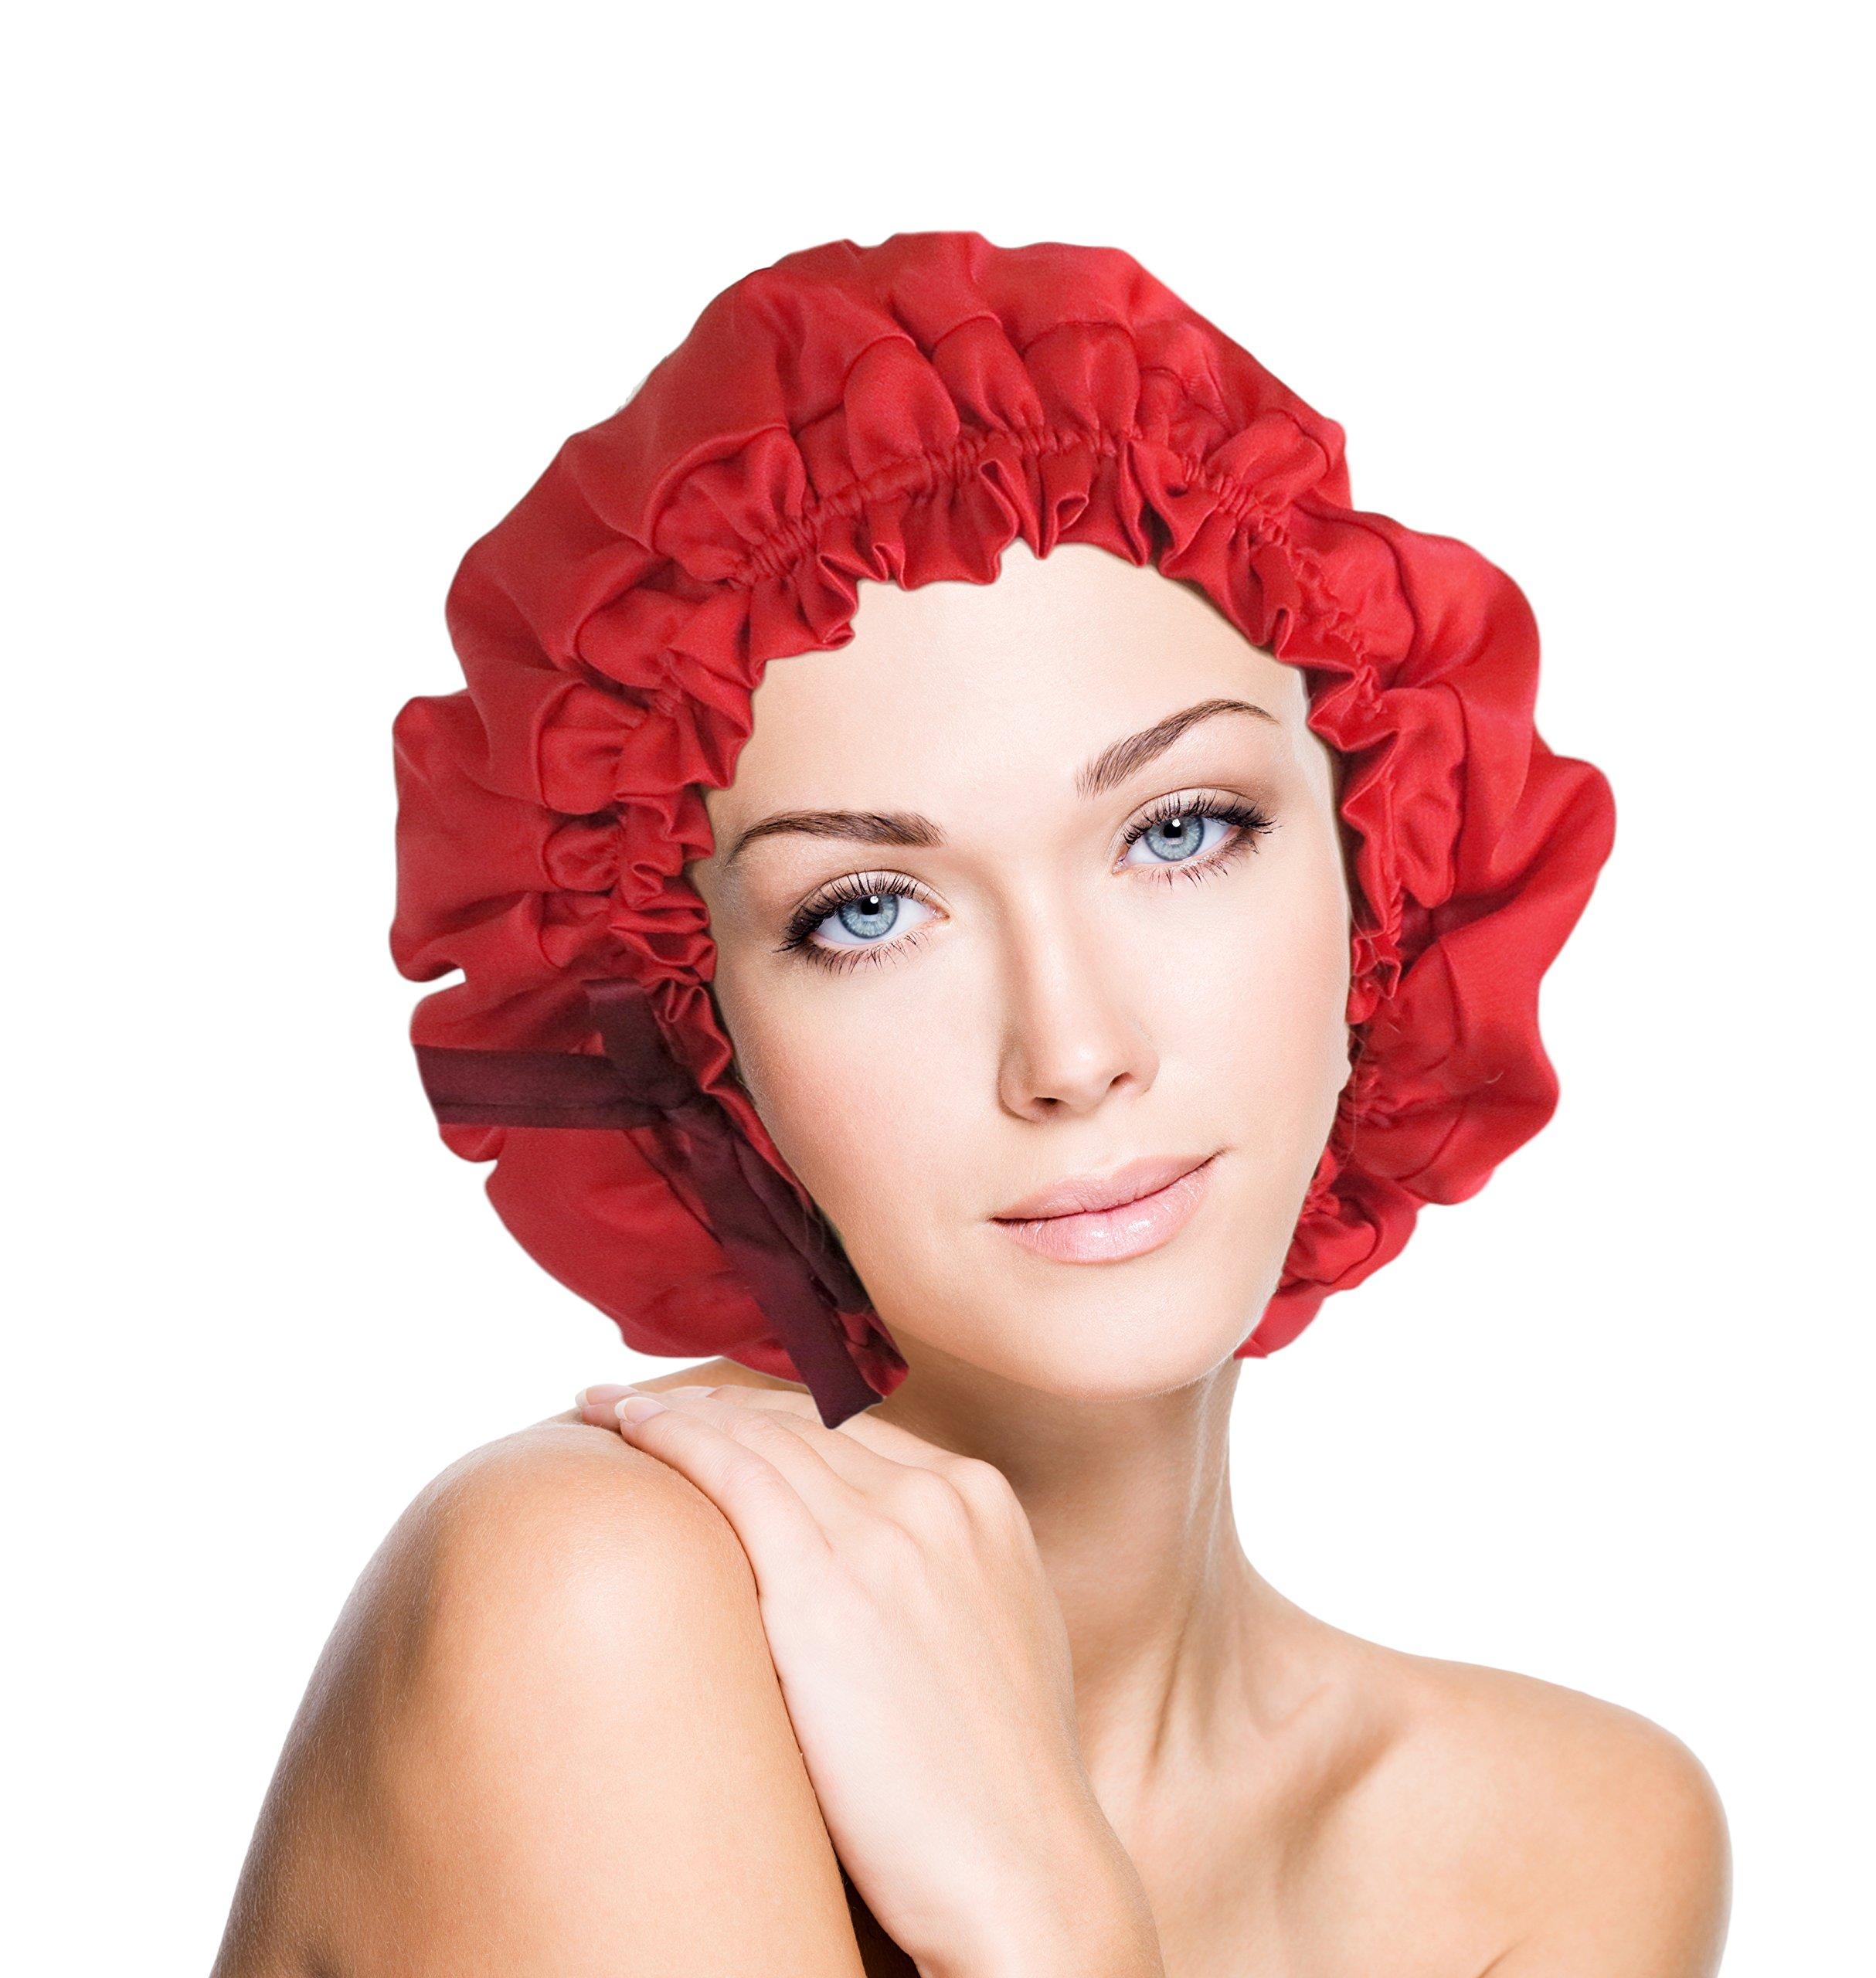 vangobeauty Silk Sleep Cap Bonnet Hat Adjustable Sexy Bright Red